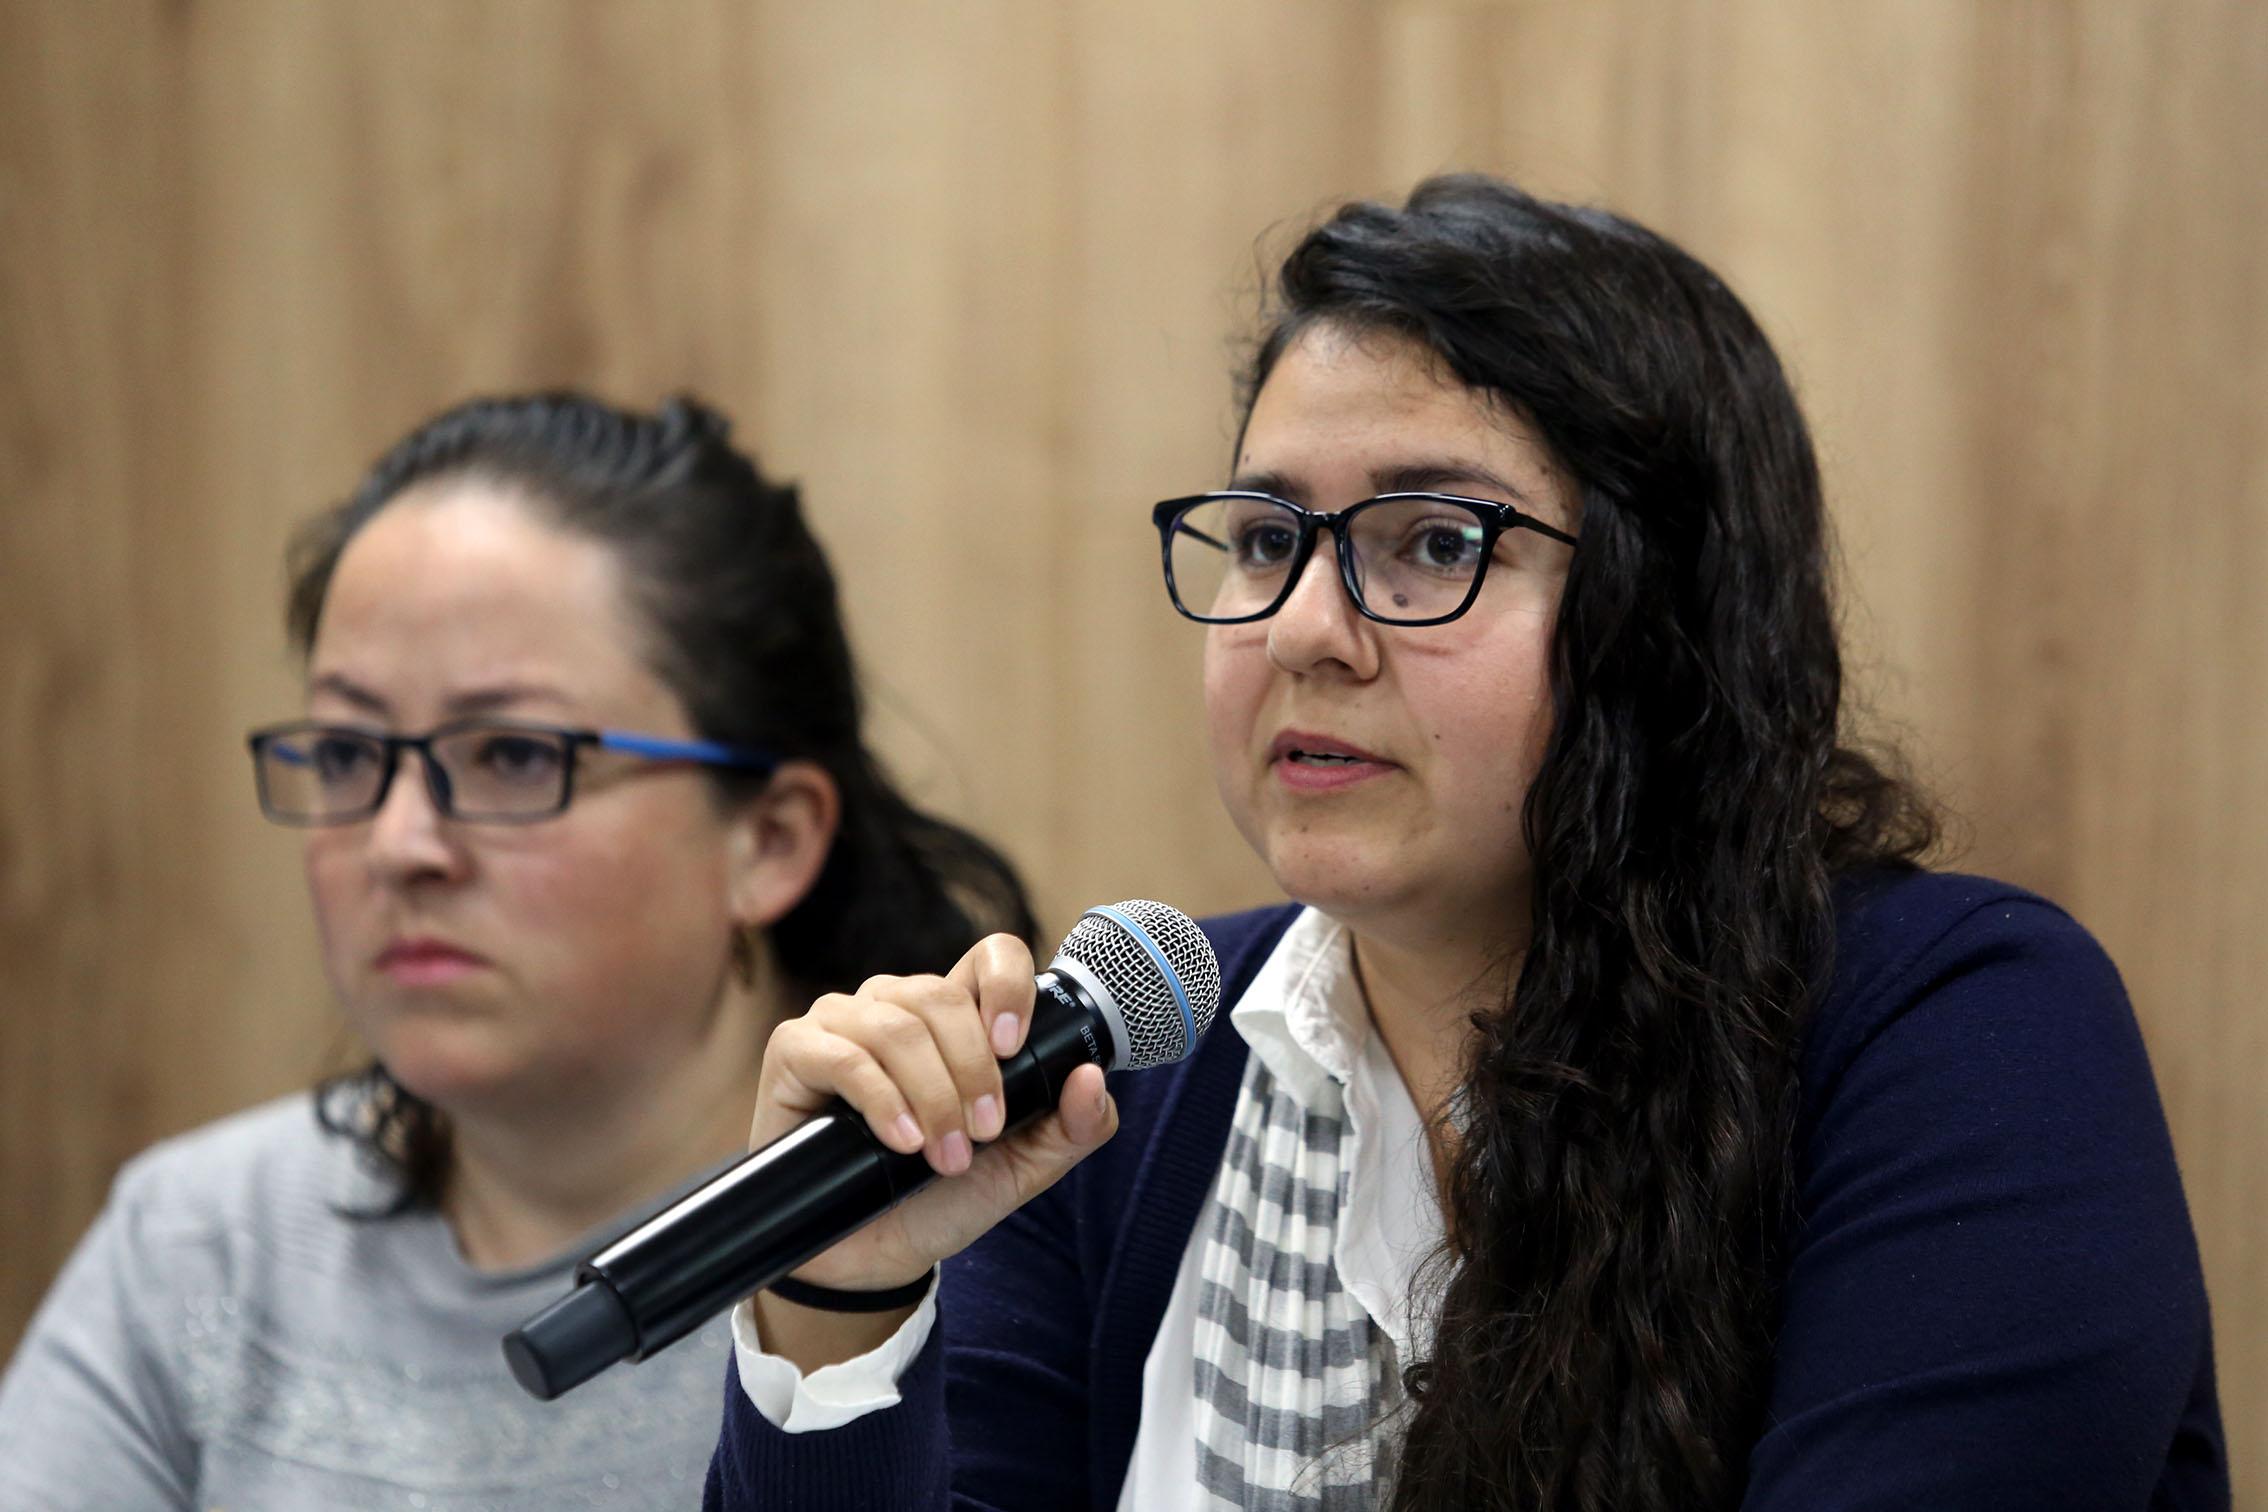 Ana Belén Vázquez Vázquez hablando al microfono